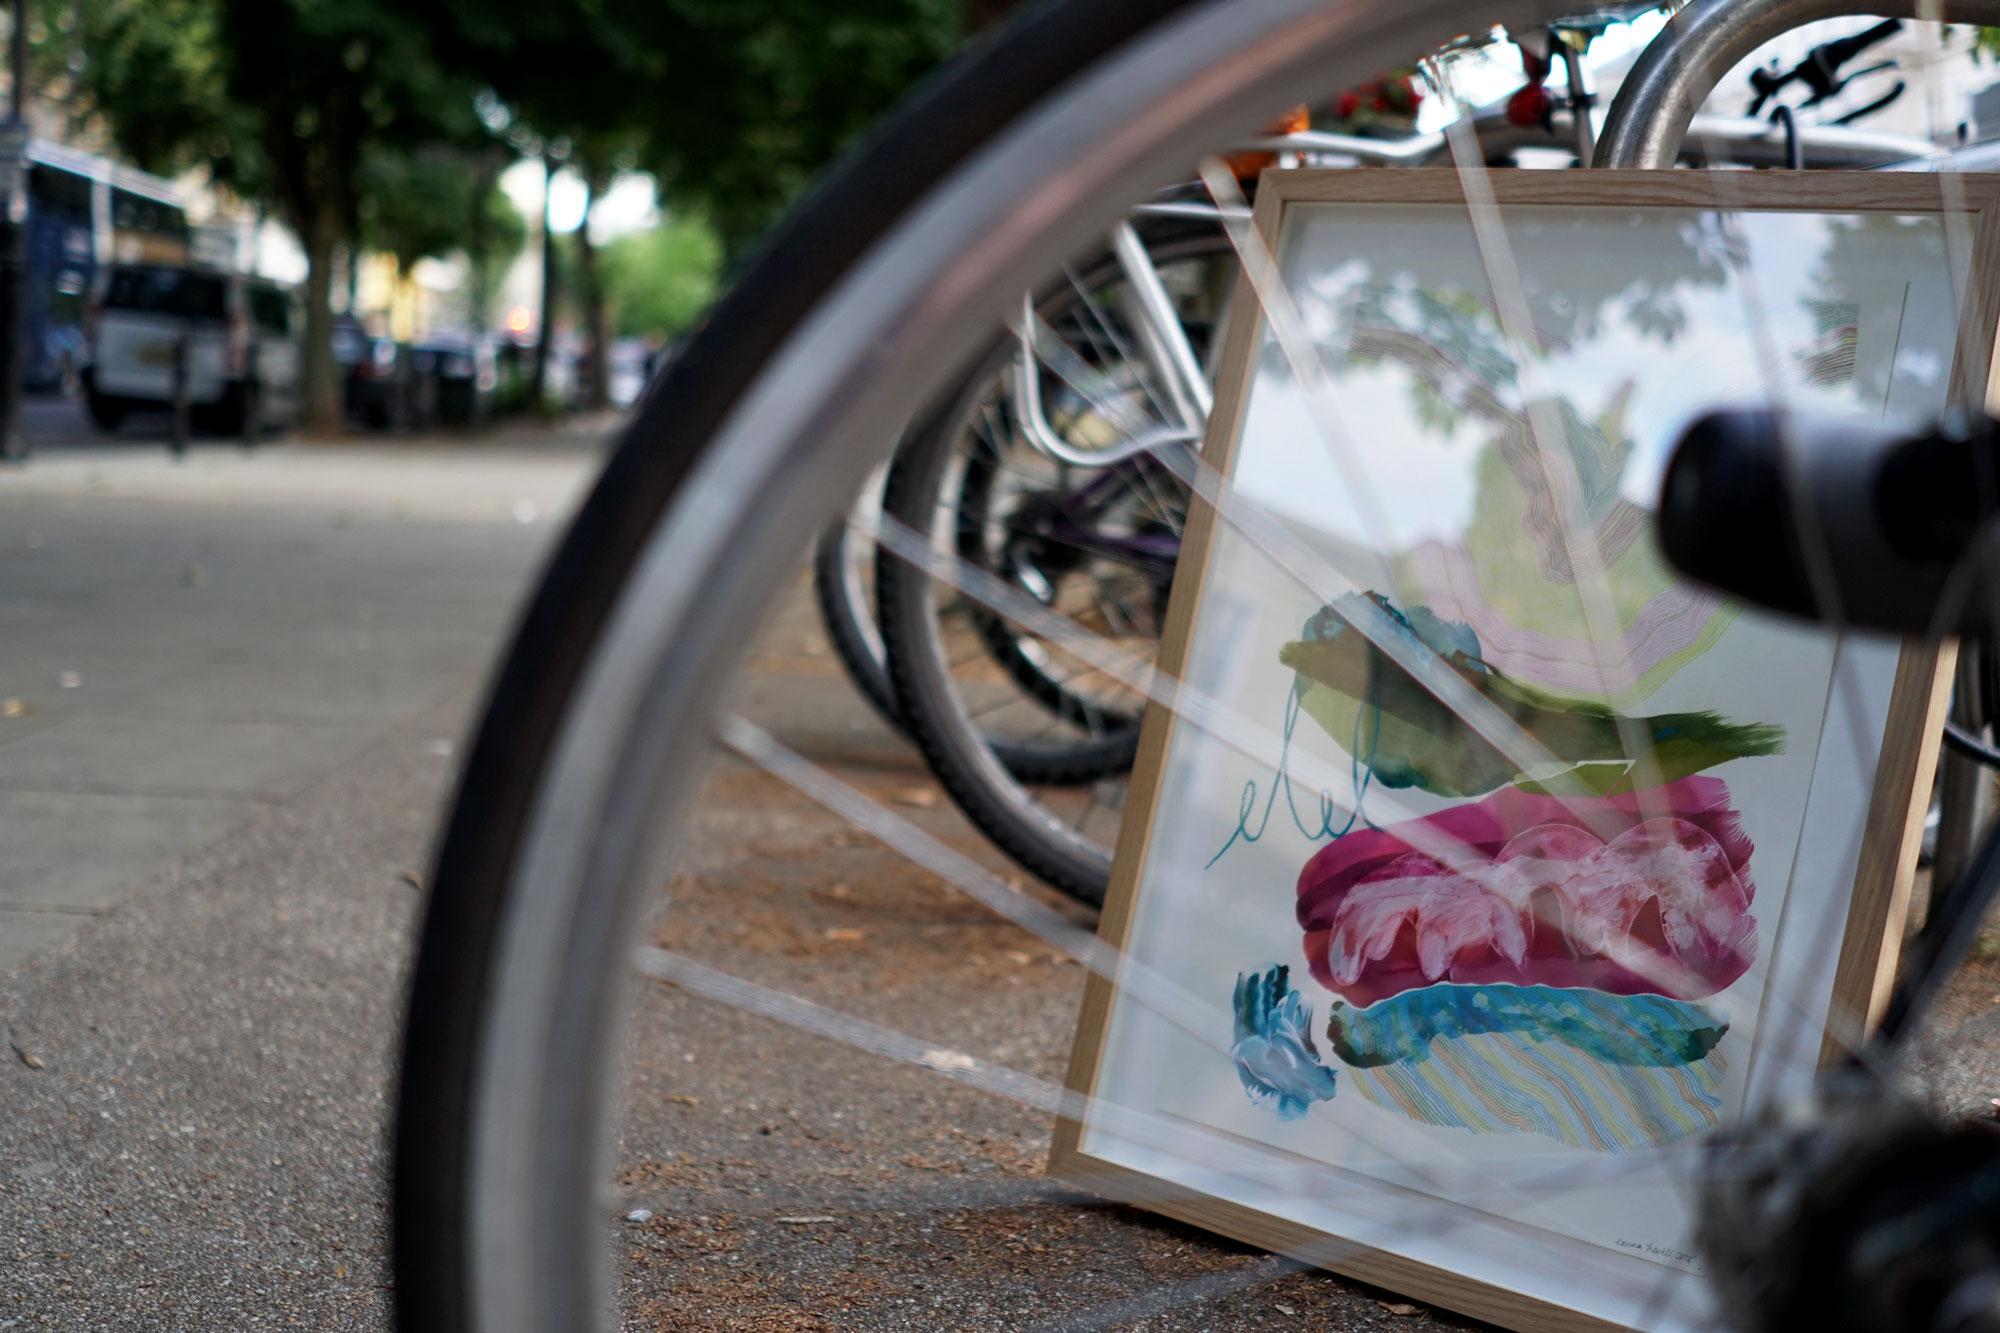 Montpellier promenade painting